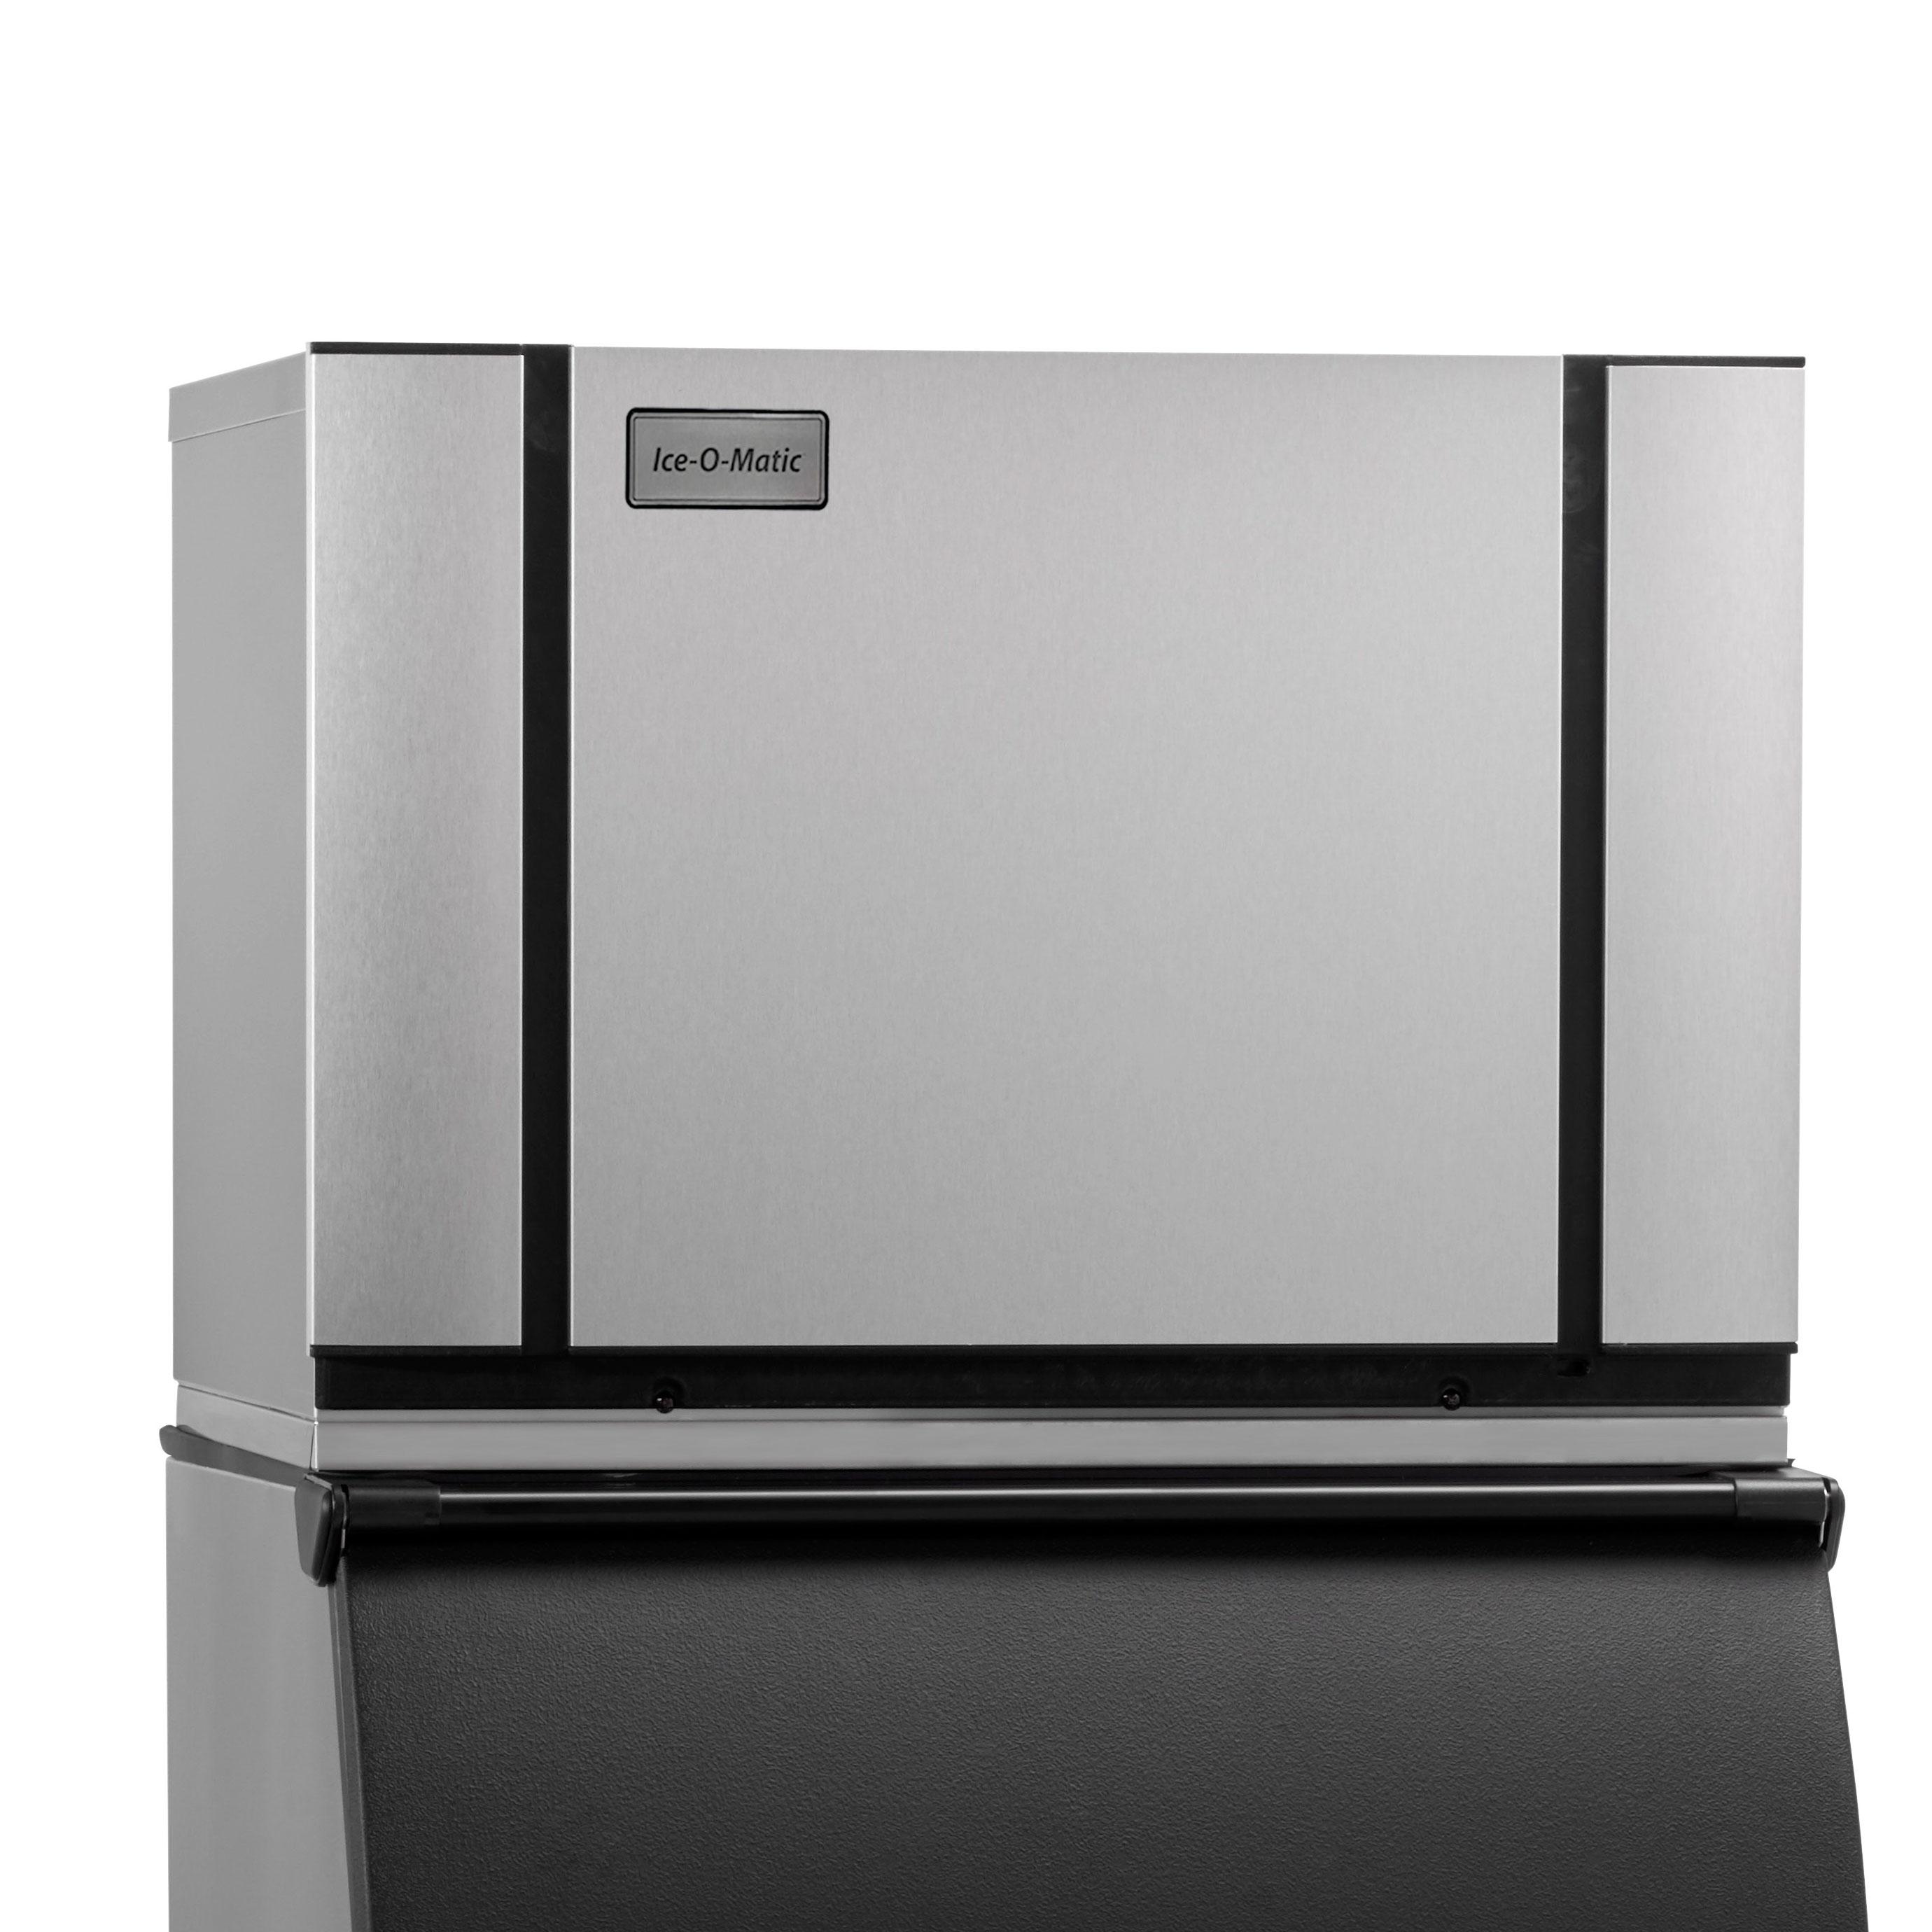 Ice-O-Matic CIM0530FR ice maker, cube-style